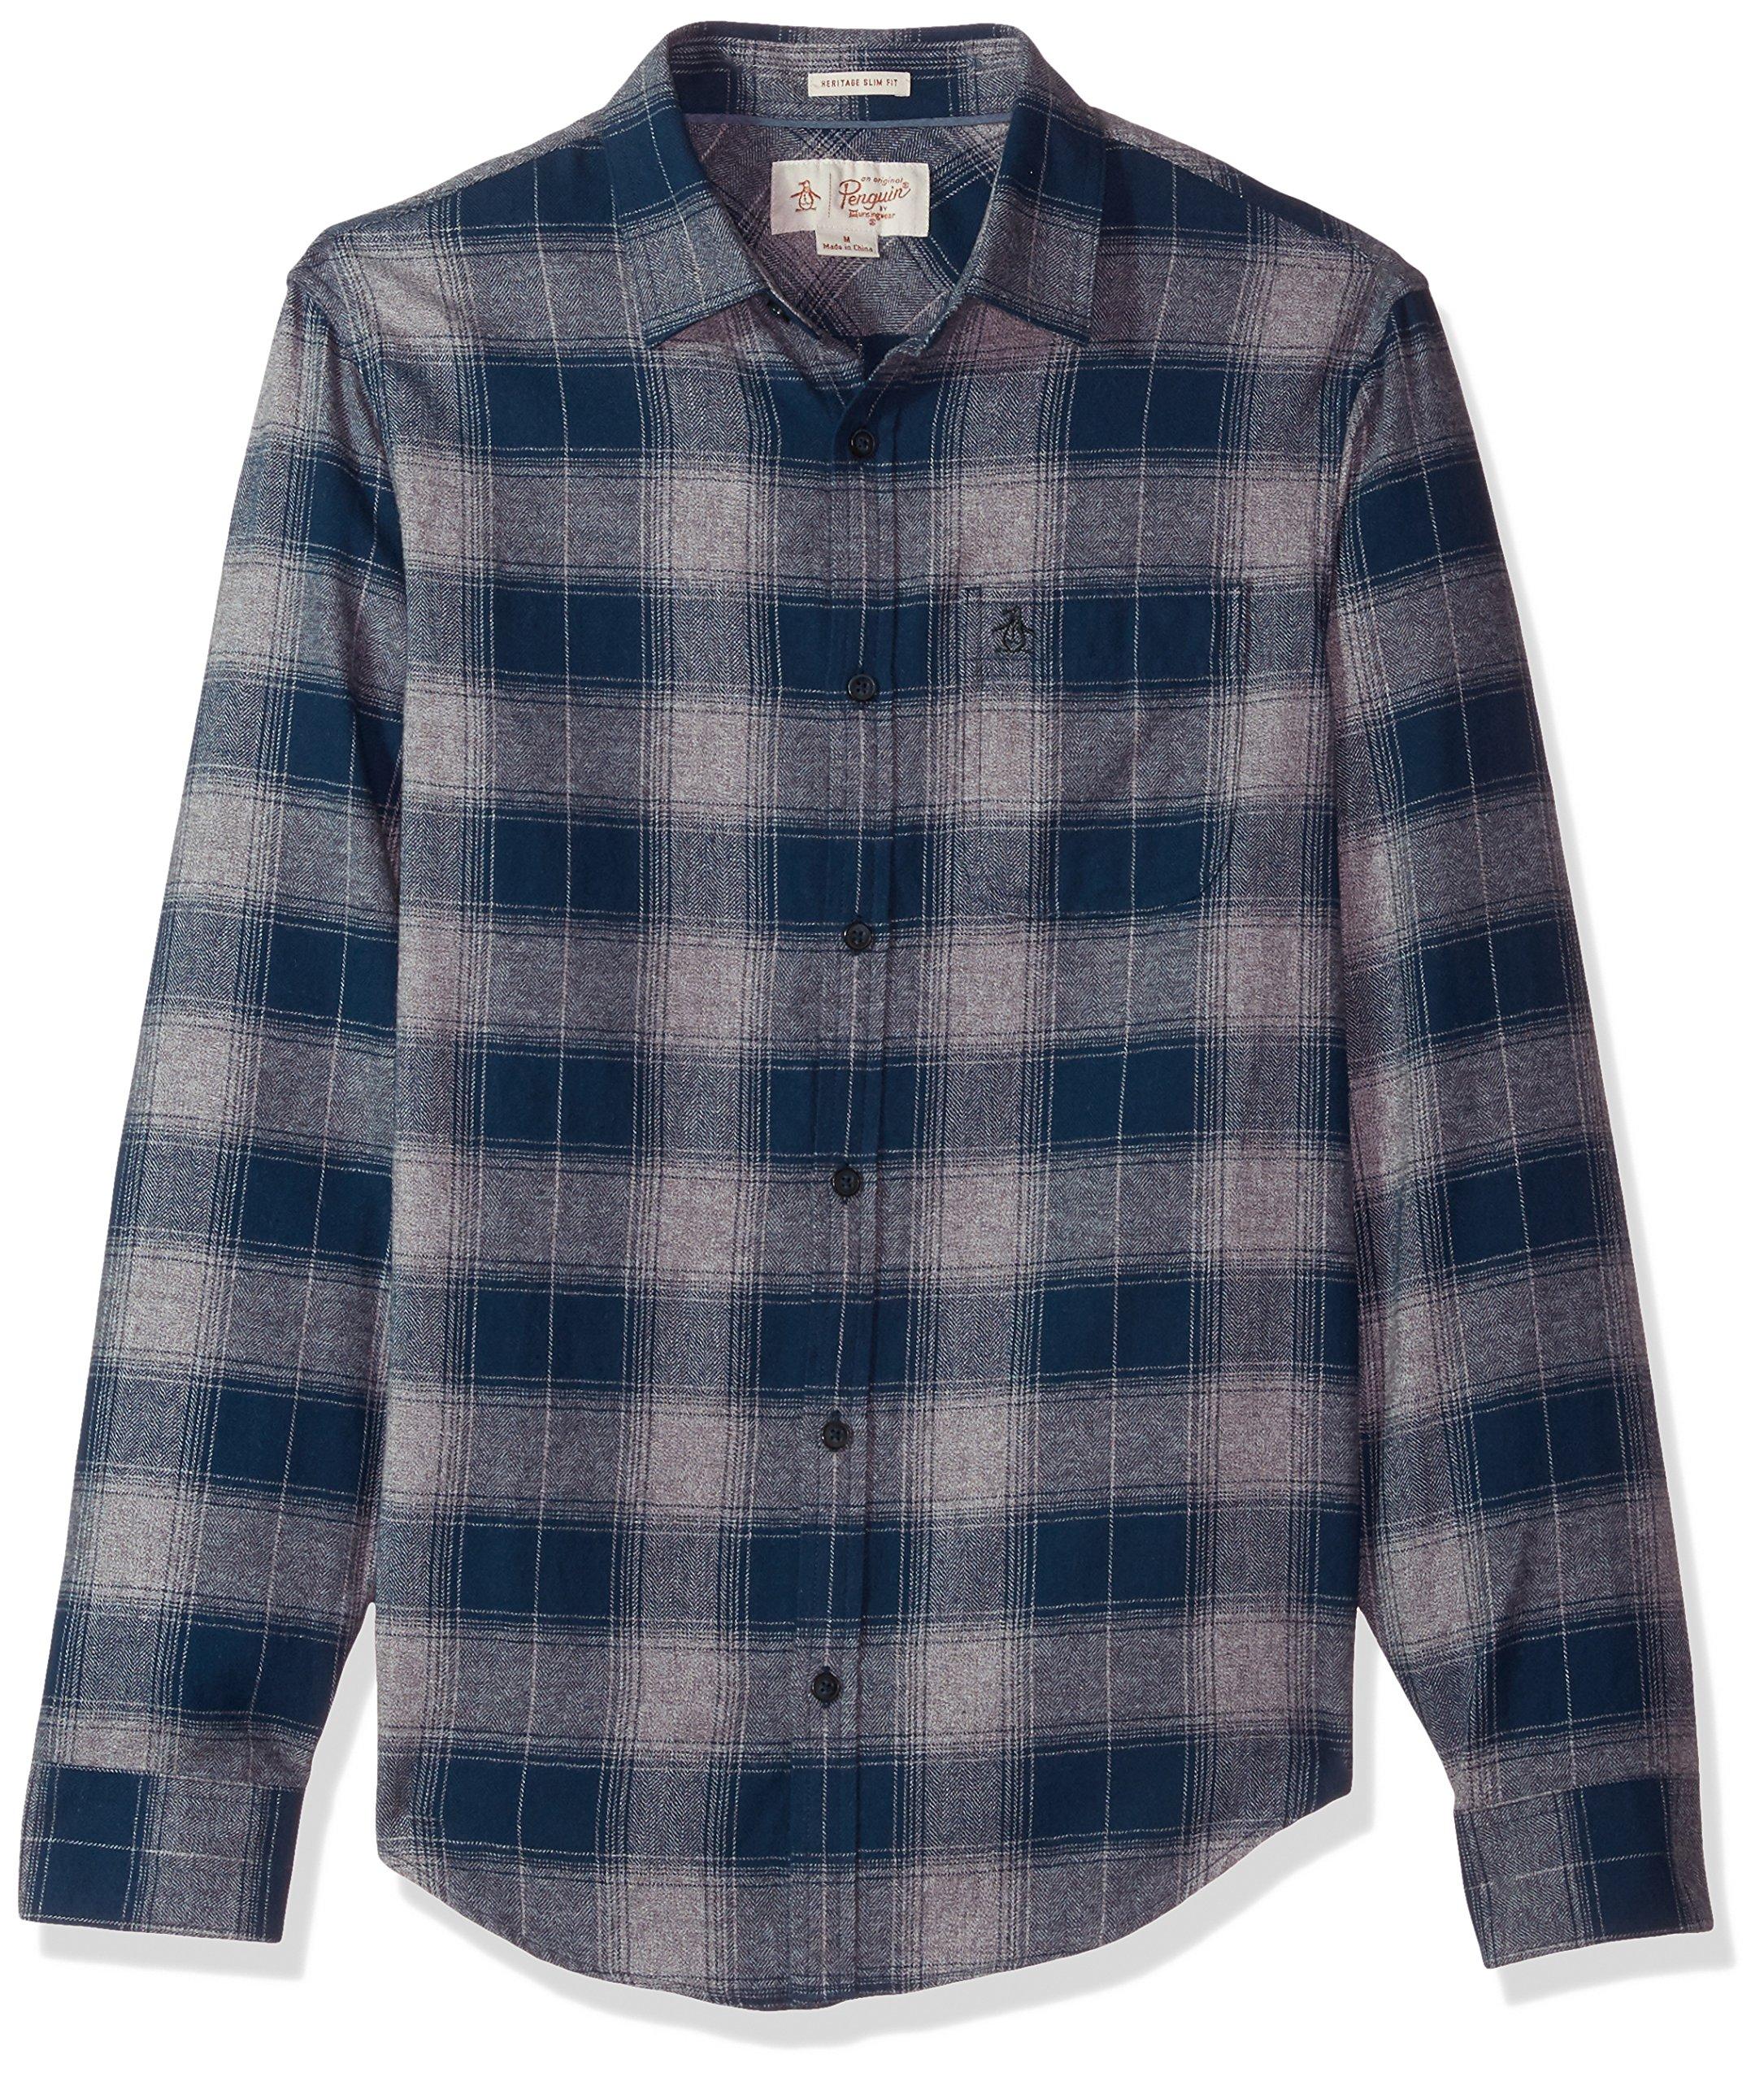 Original Penguin Men's Marled Herringbone Plaid Shirt, Dark Sapphire, Medium